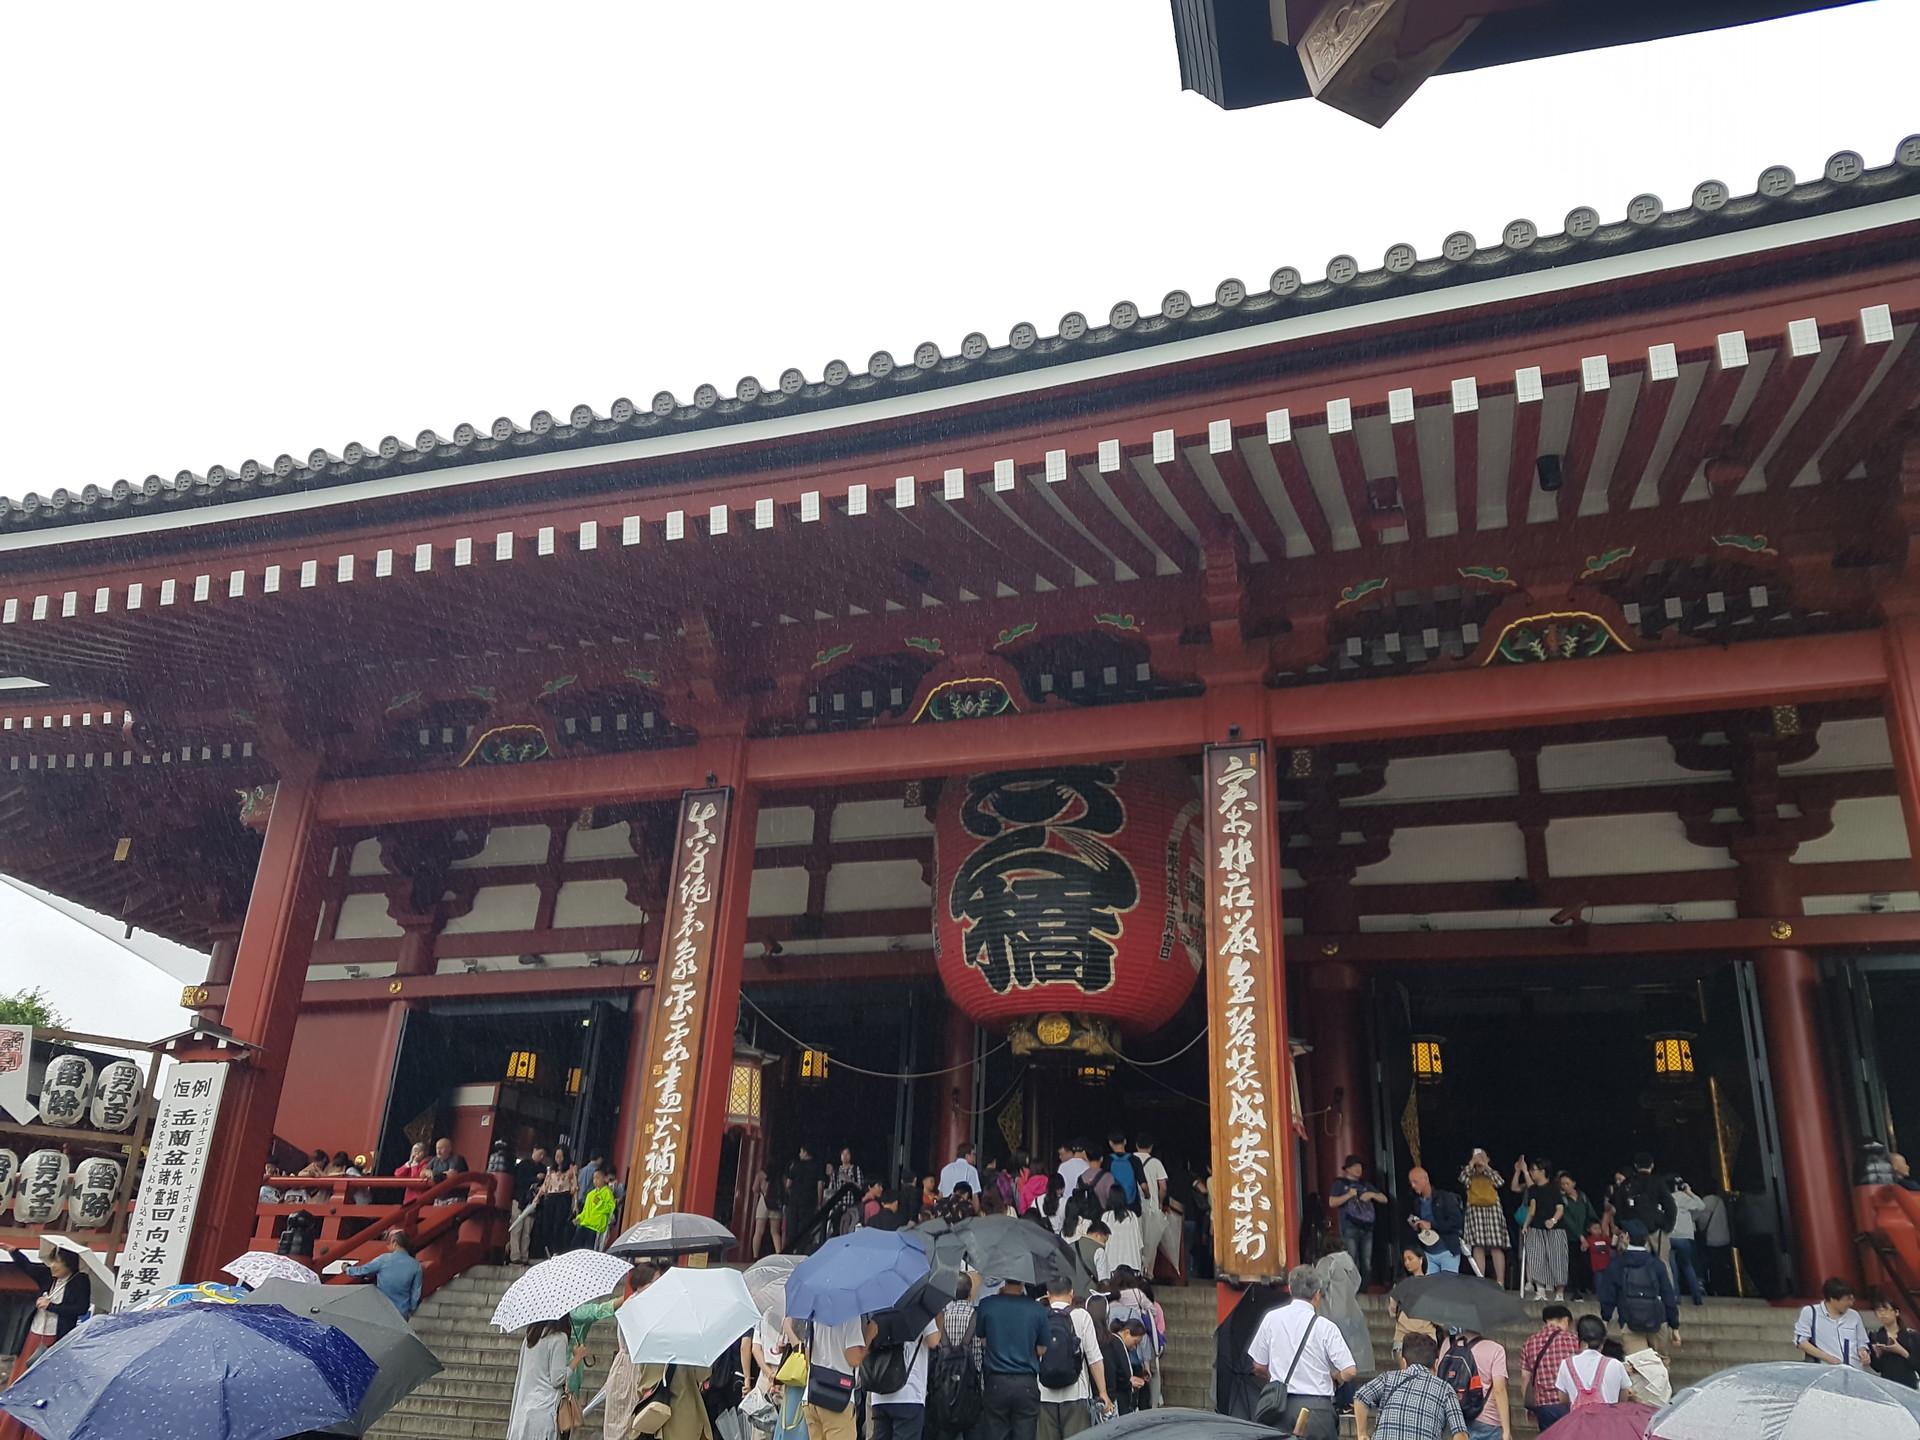 sensoji-temple-detours-2ae63883df508fde4